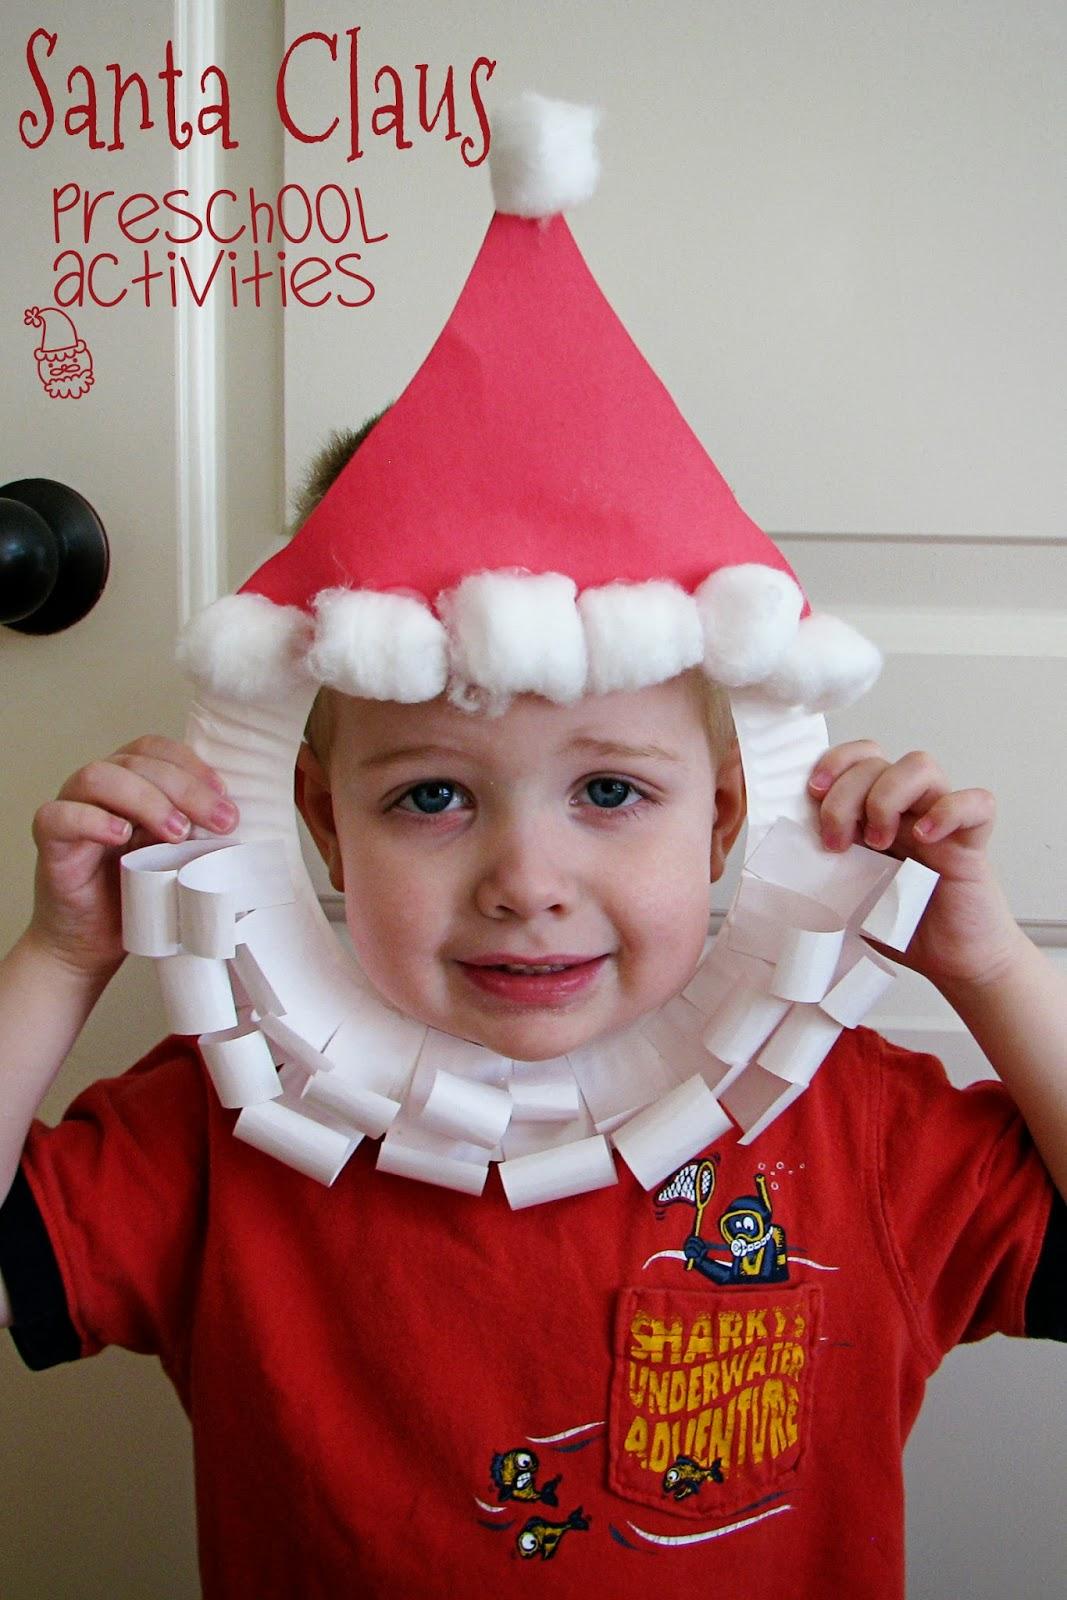 santa claus preschool theme - Santa Claus Activities